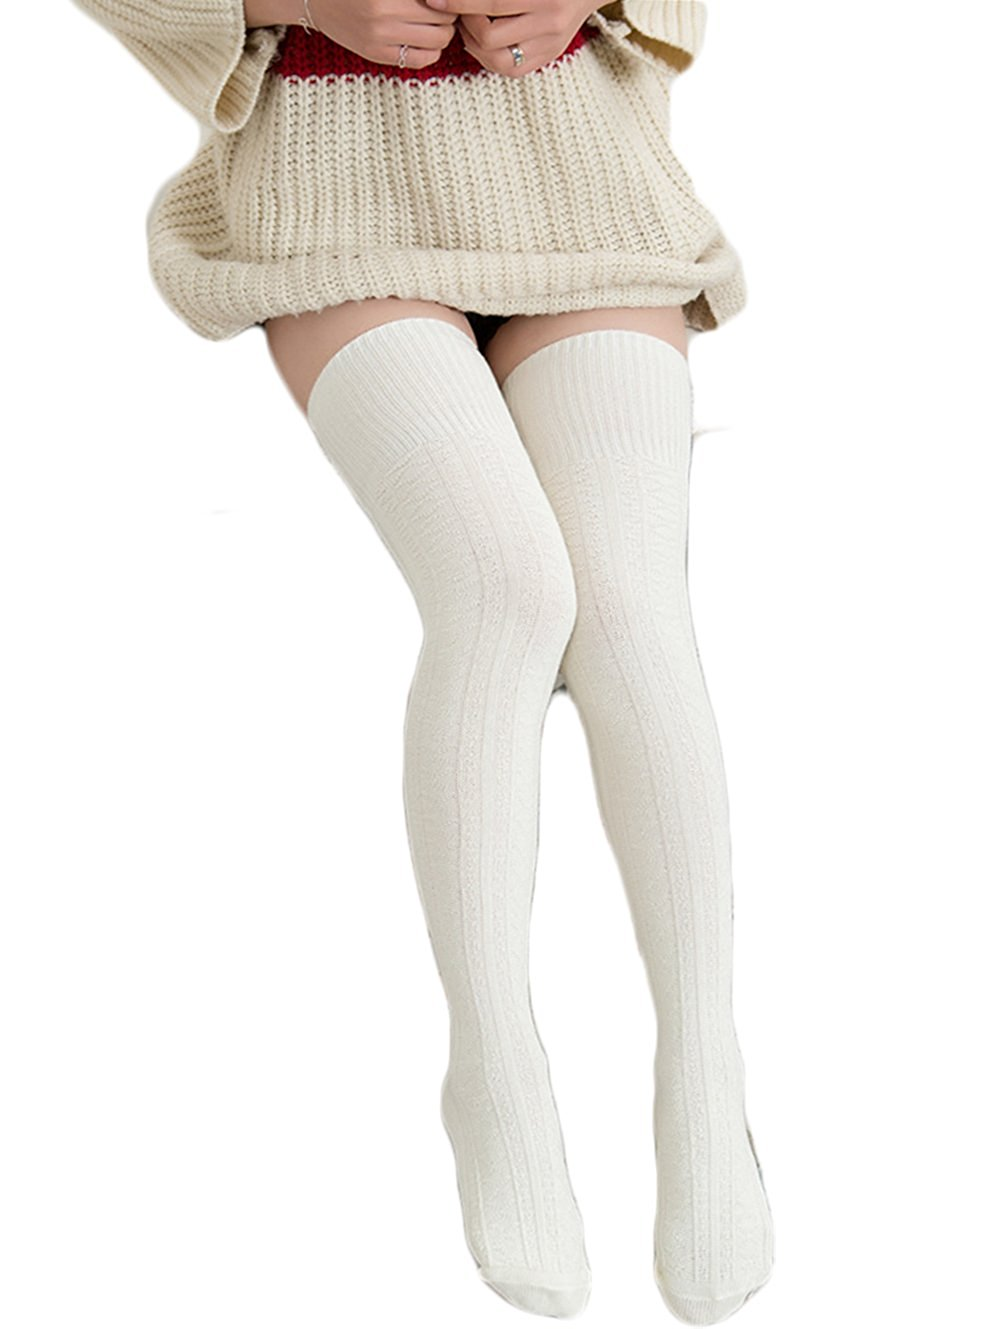 1a66240fccb Get Quotations · HITOP Womens Spring Over Knee Leg Warmer Crochet Thigh High  Boot Socks Girls Leggings